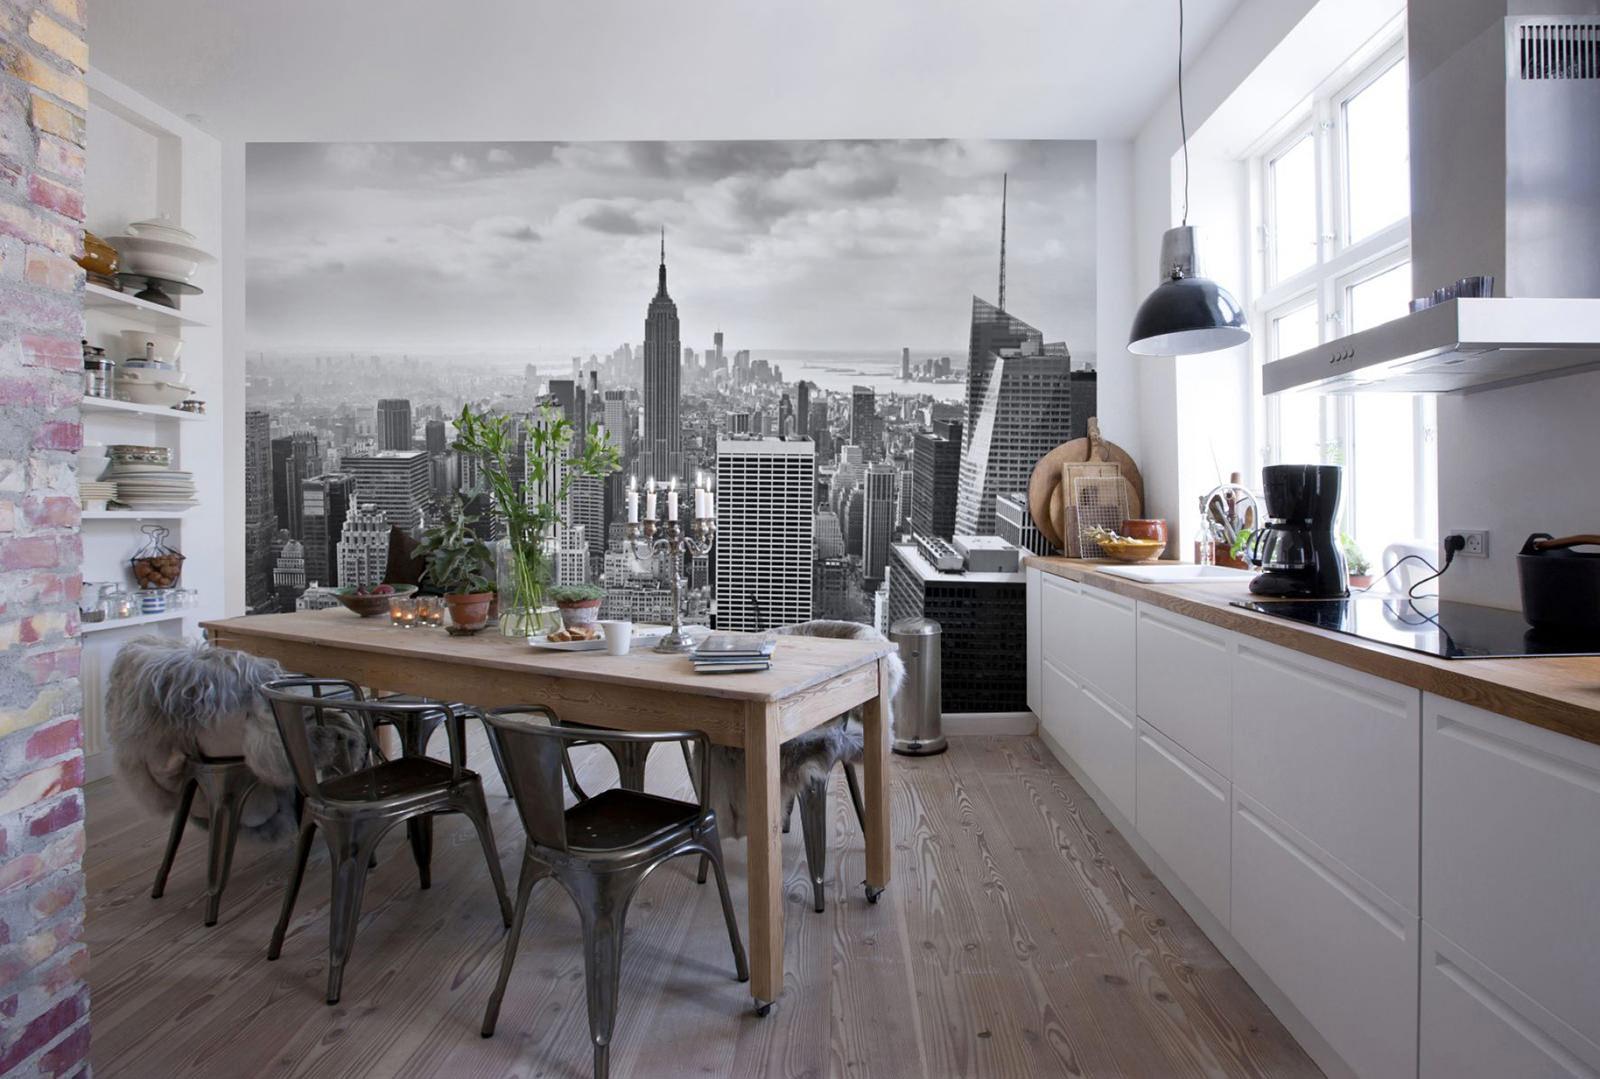 фото кухня с фотообоями